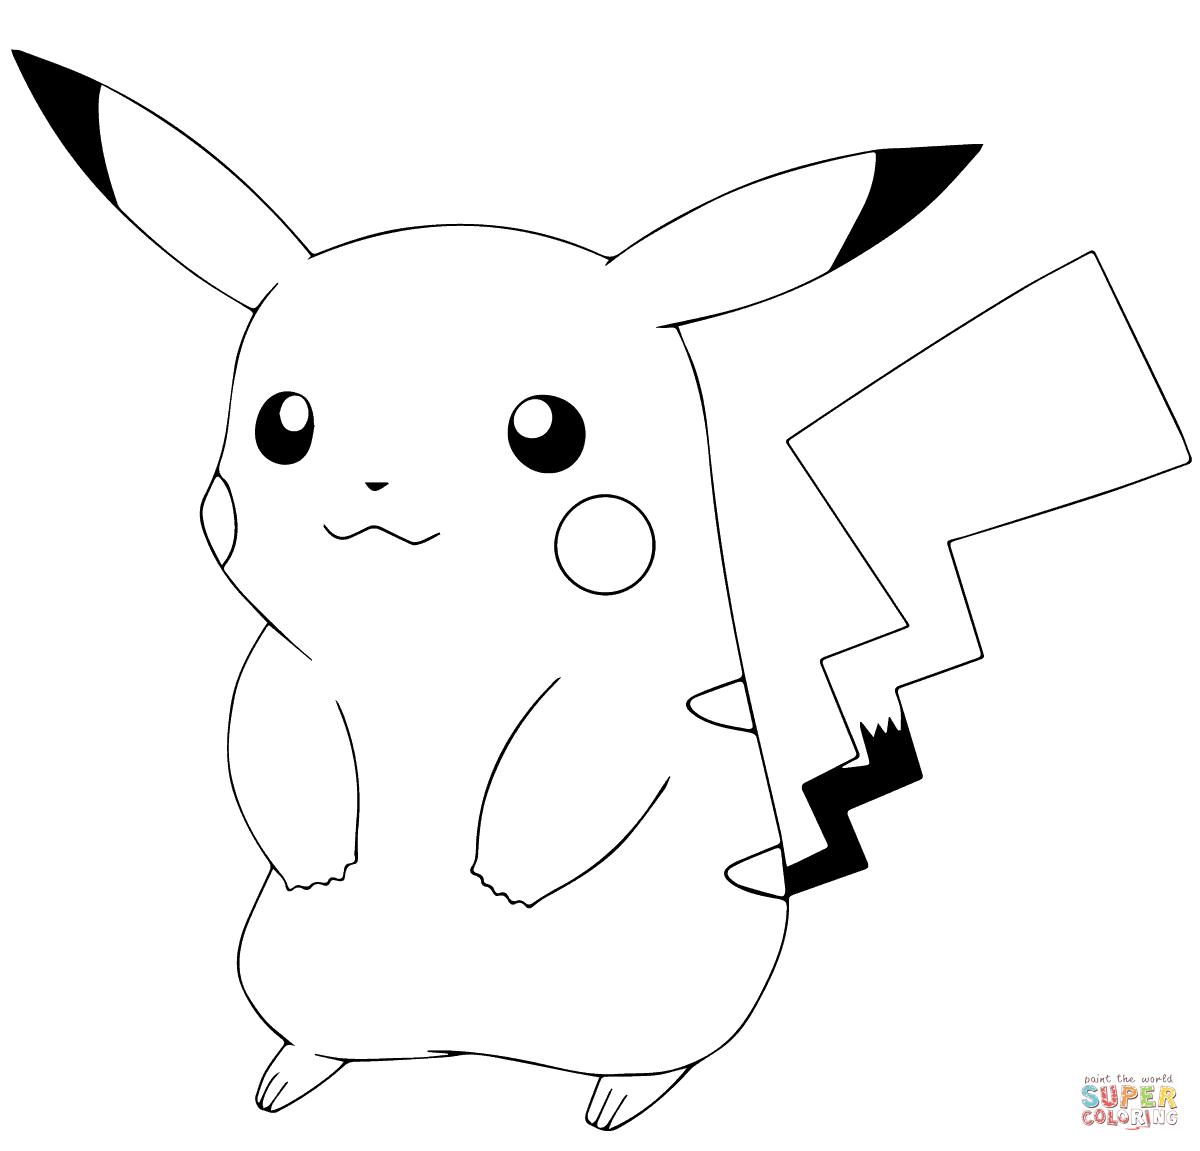 Pokémon Go Pikachu Coloring Page | Free Printable Coloring Pages - Pokemon Coloring Sheets Free Printable